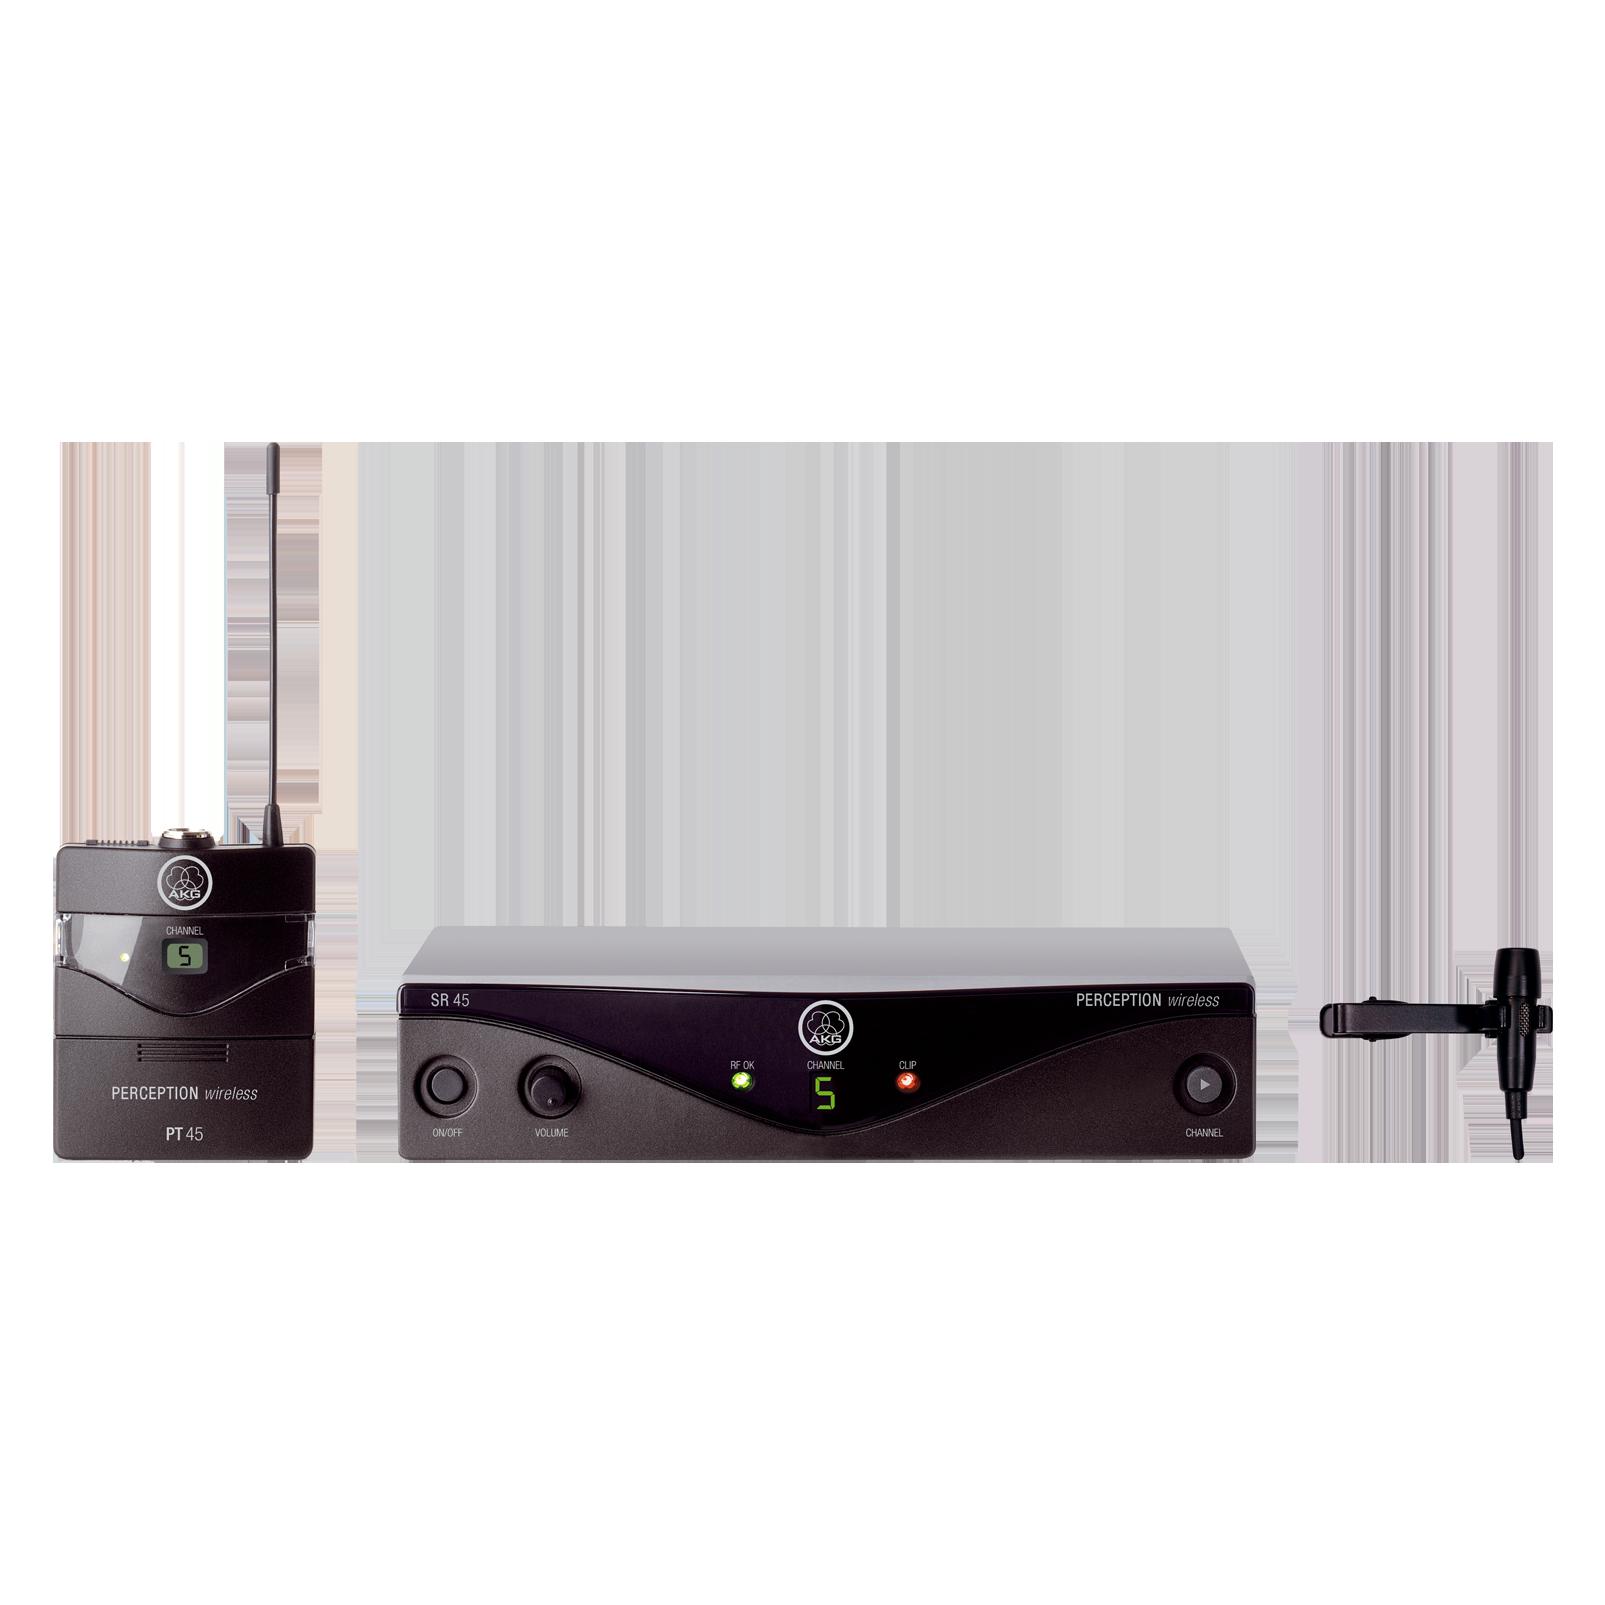 Perception Wireless 45 Presenter Set Band-C3 - Black - High-performance wireless microphone system - Hero